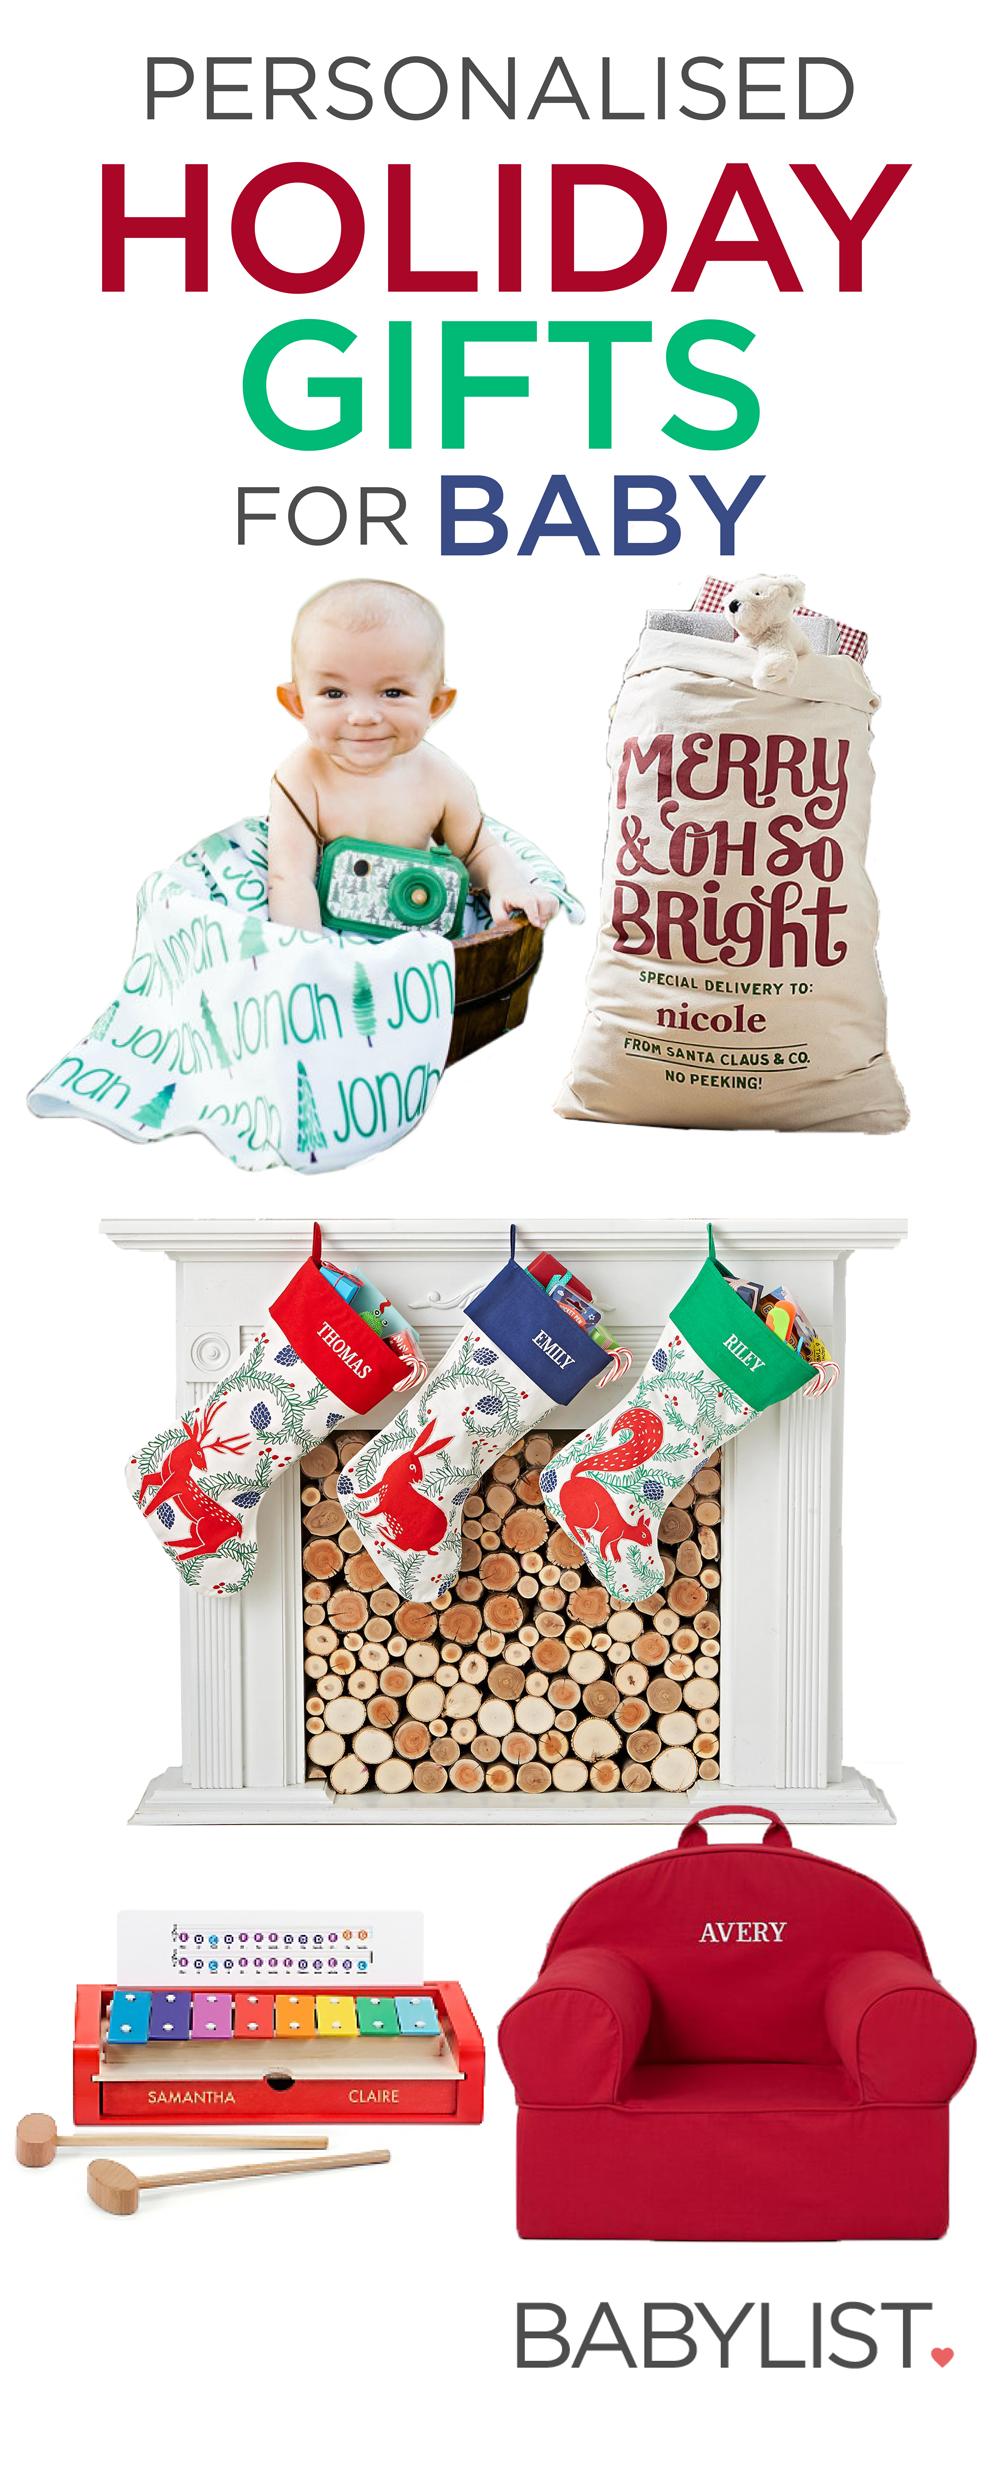 AKA Christmas presents you won't want to regift